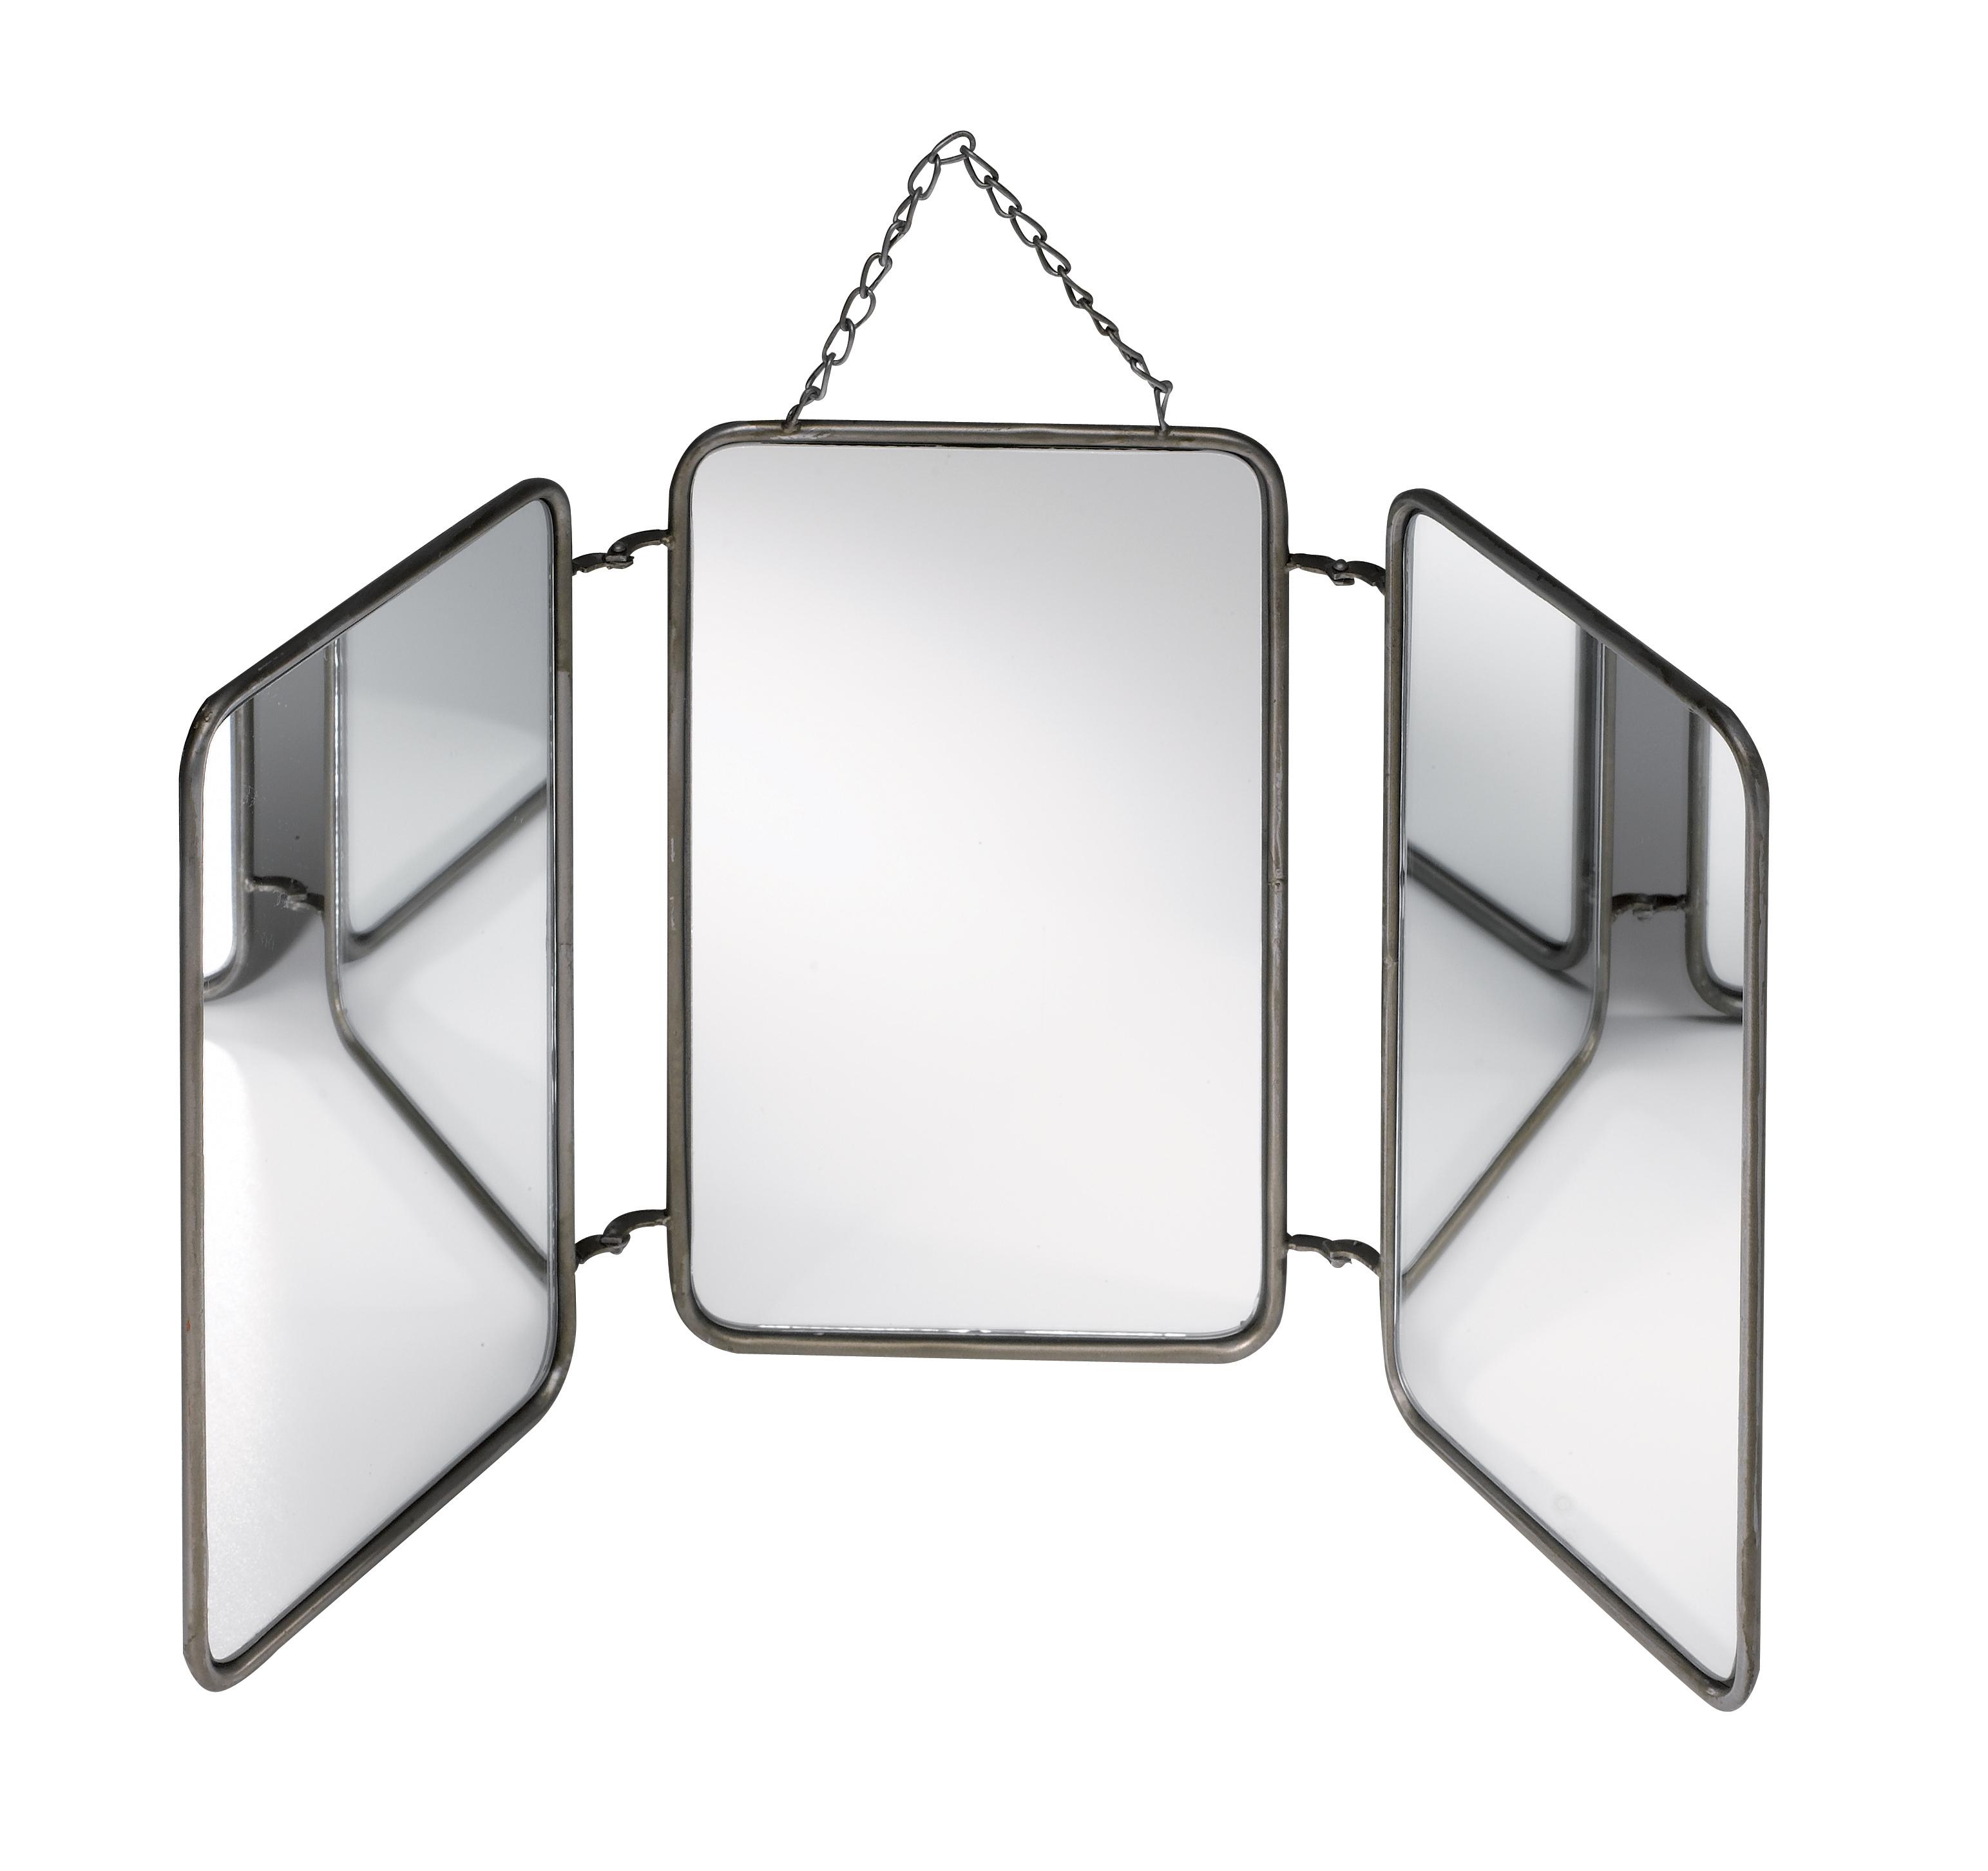 collection printemps ete 2014 conforama confo d co rise and shine. Black Bedroom Furniture Sets. Home Design Ideas